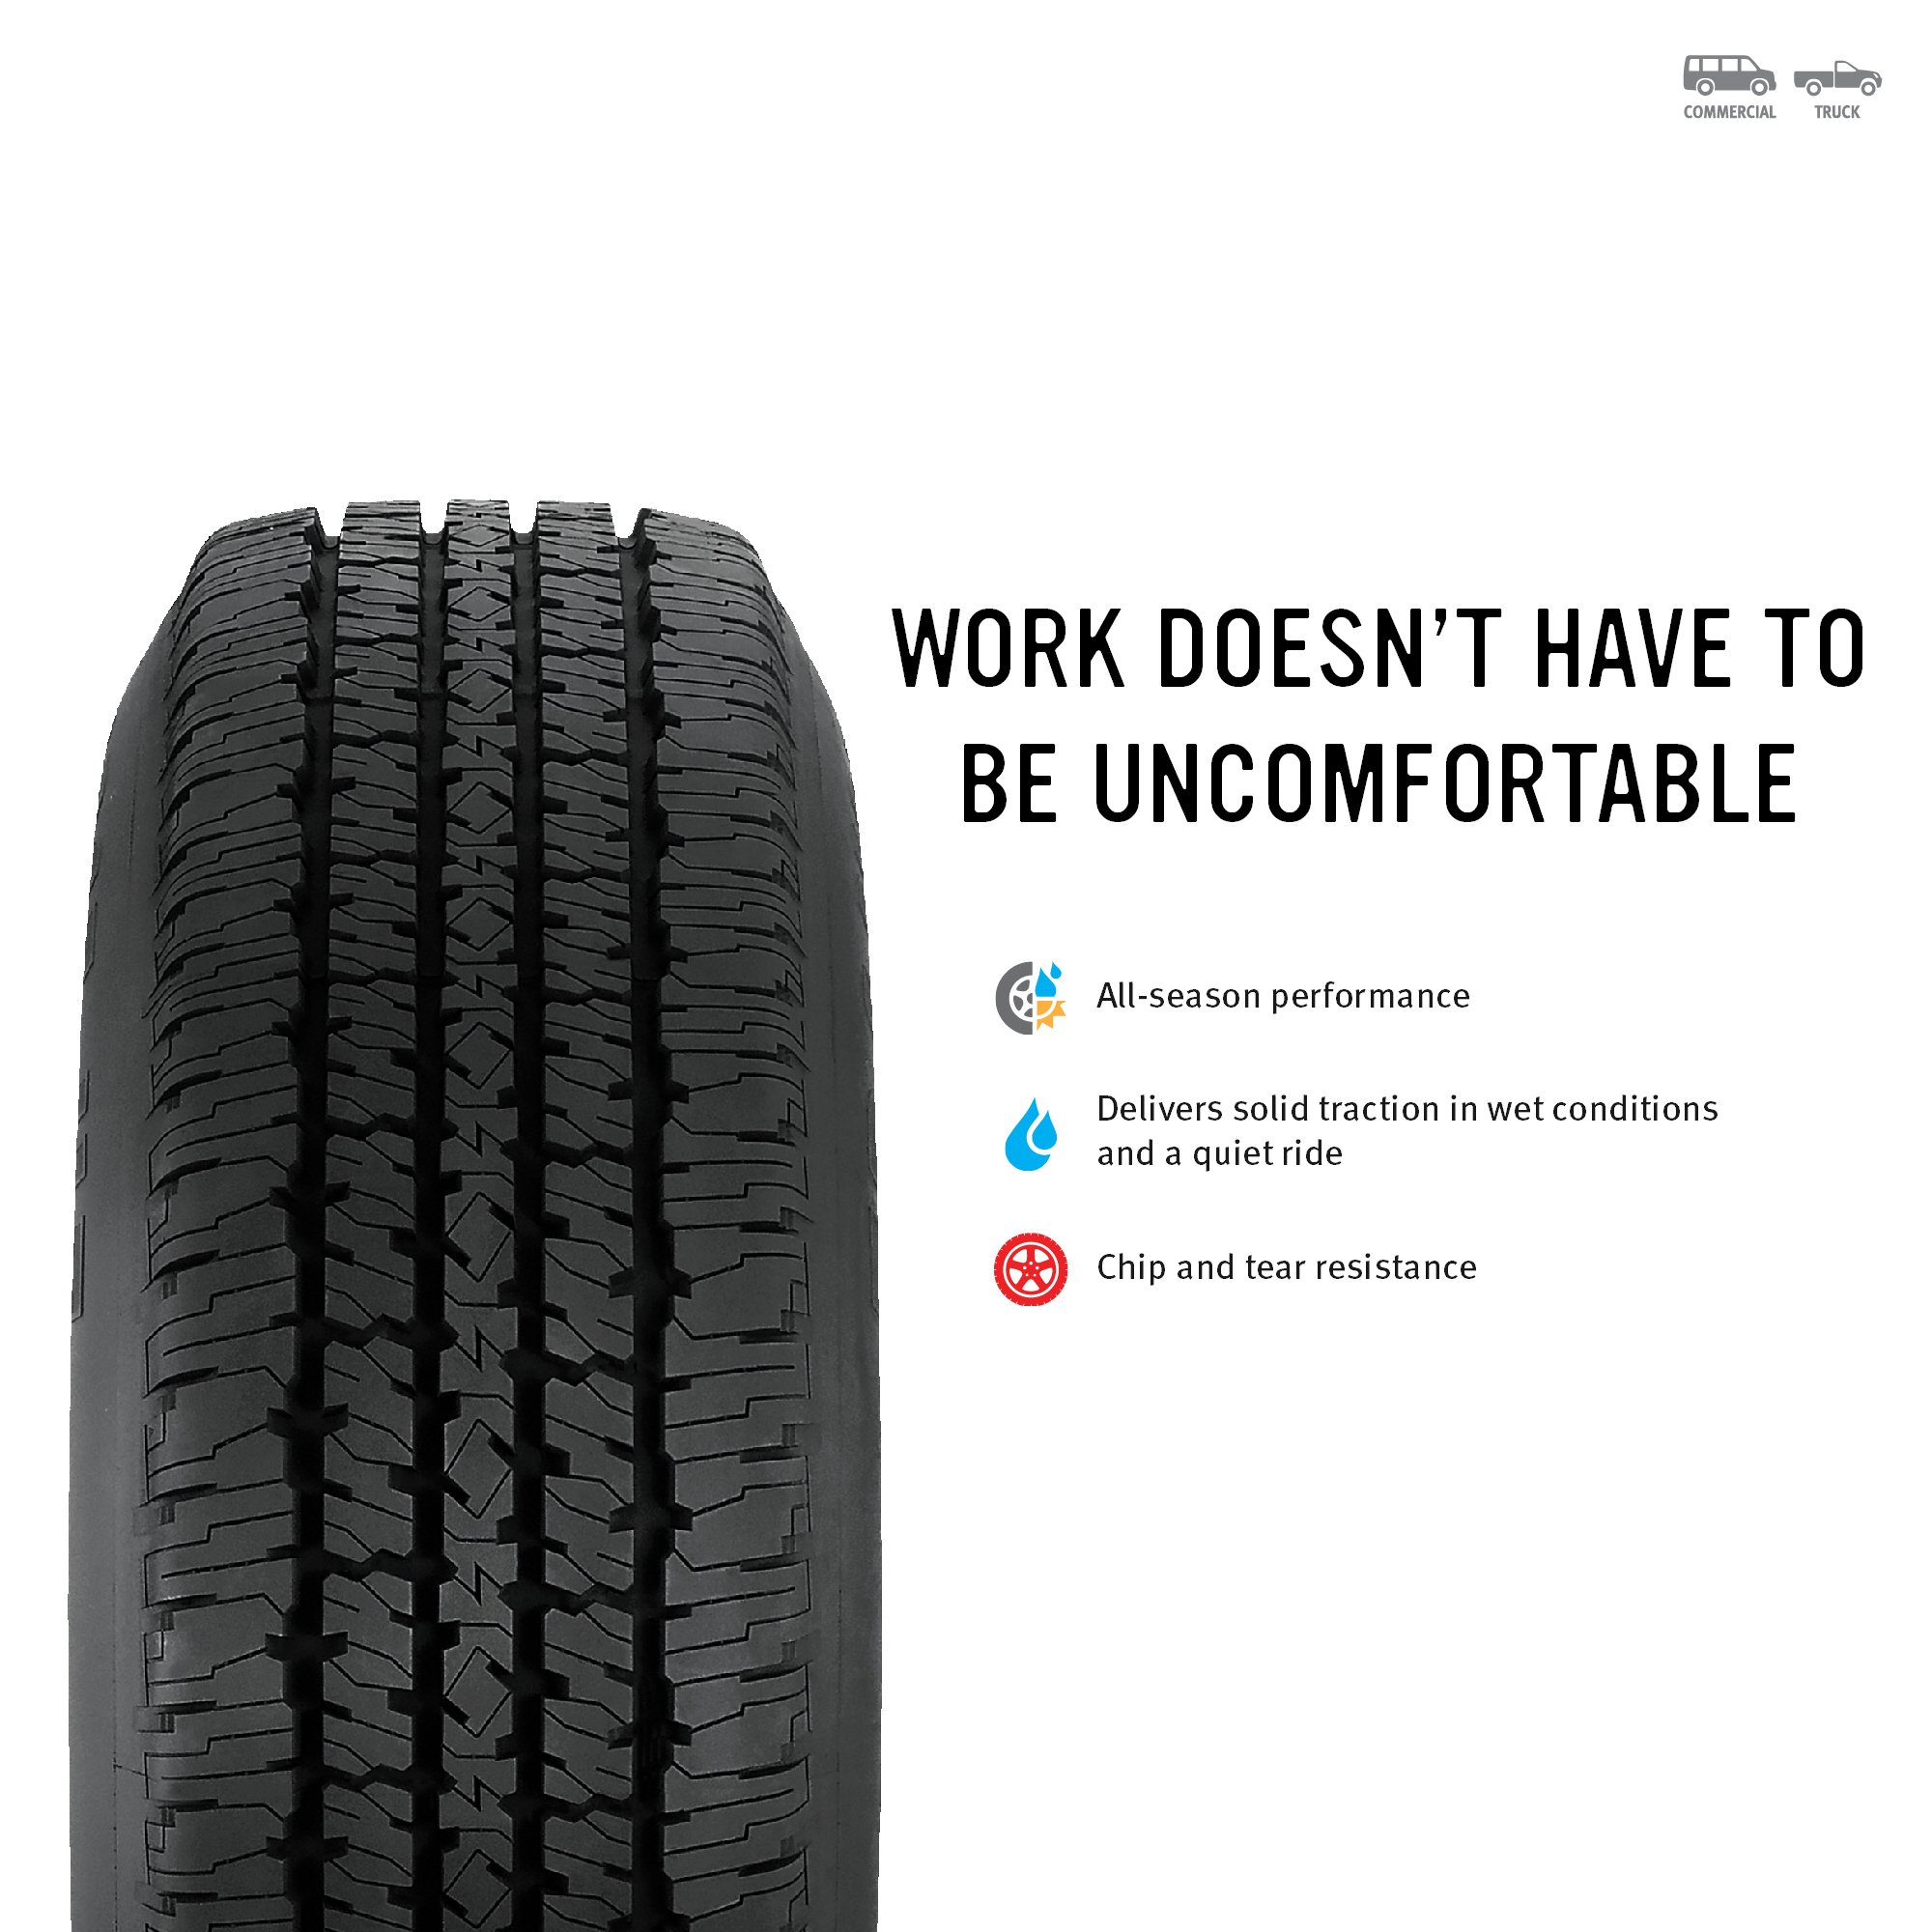 Firestone Transforce HT Radial Tire - 8.75R16.5 115R